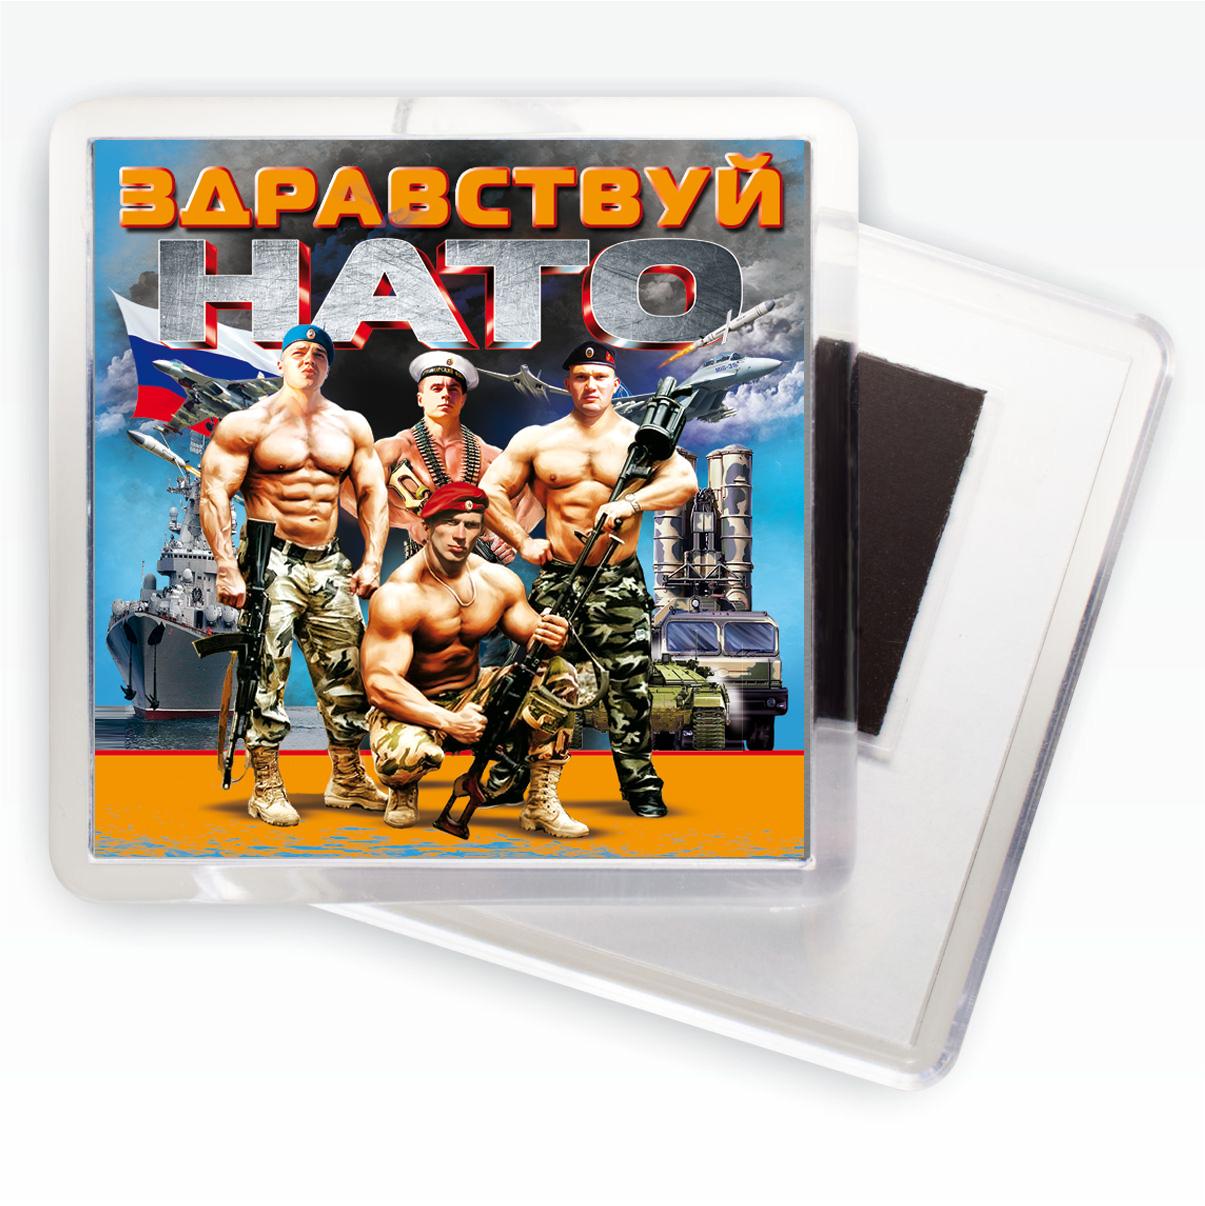 "Магнитик ""Здравствуй НАТО"" - купить онлайн"